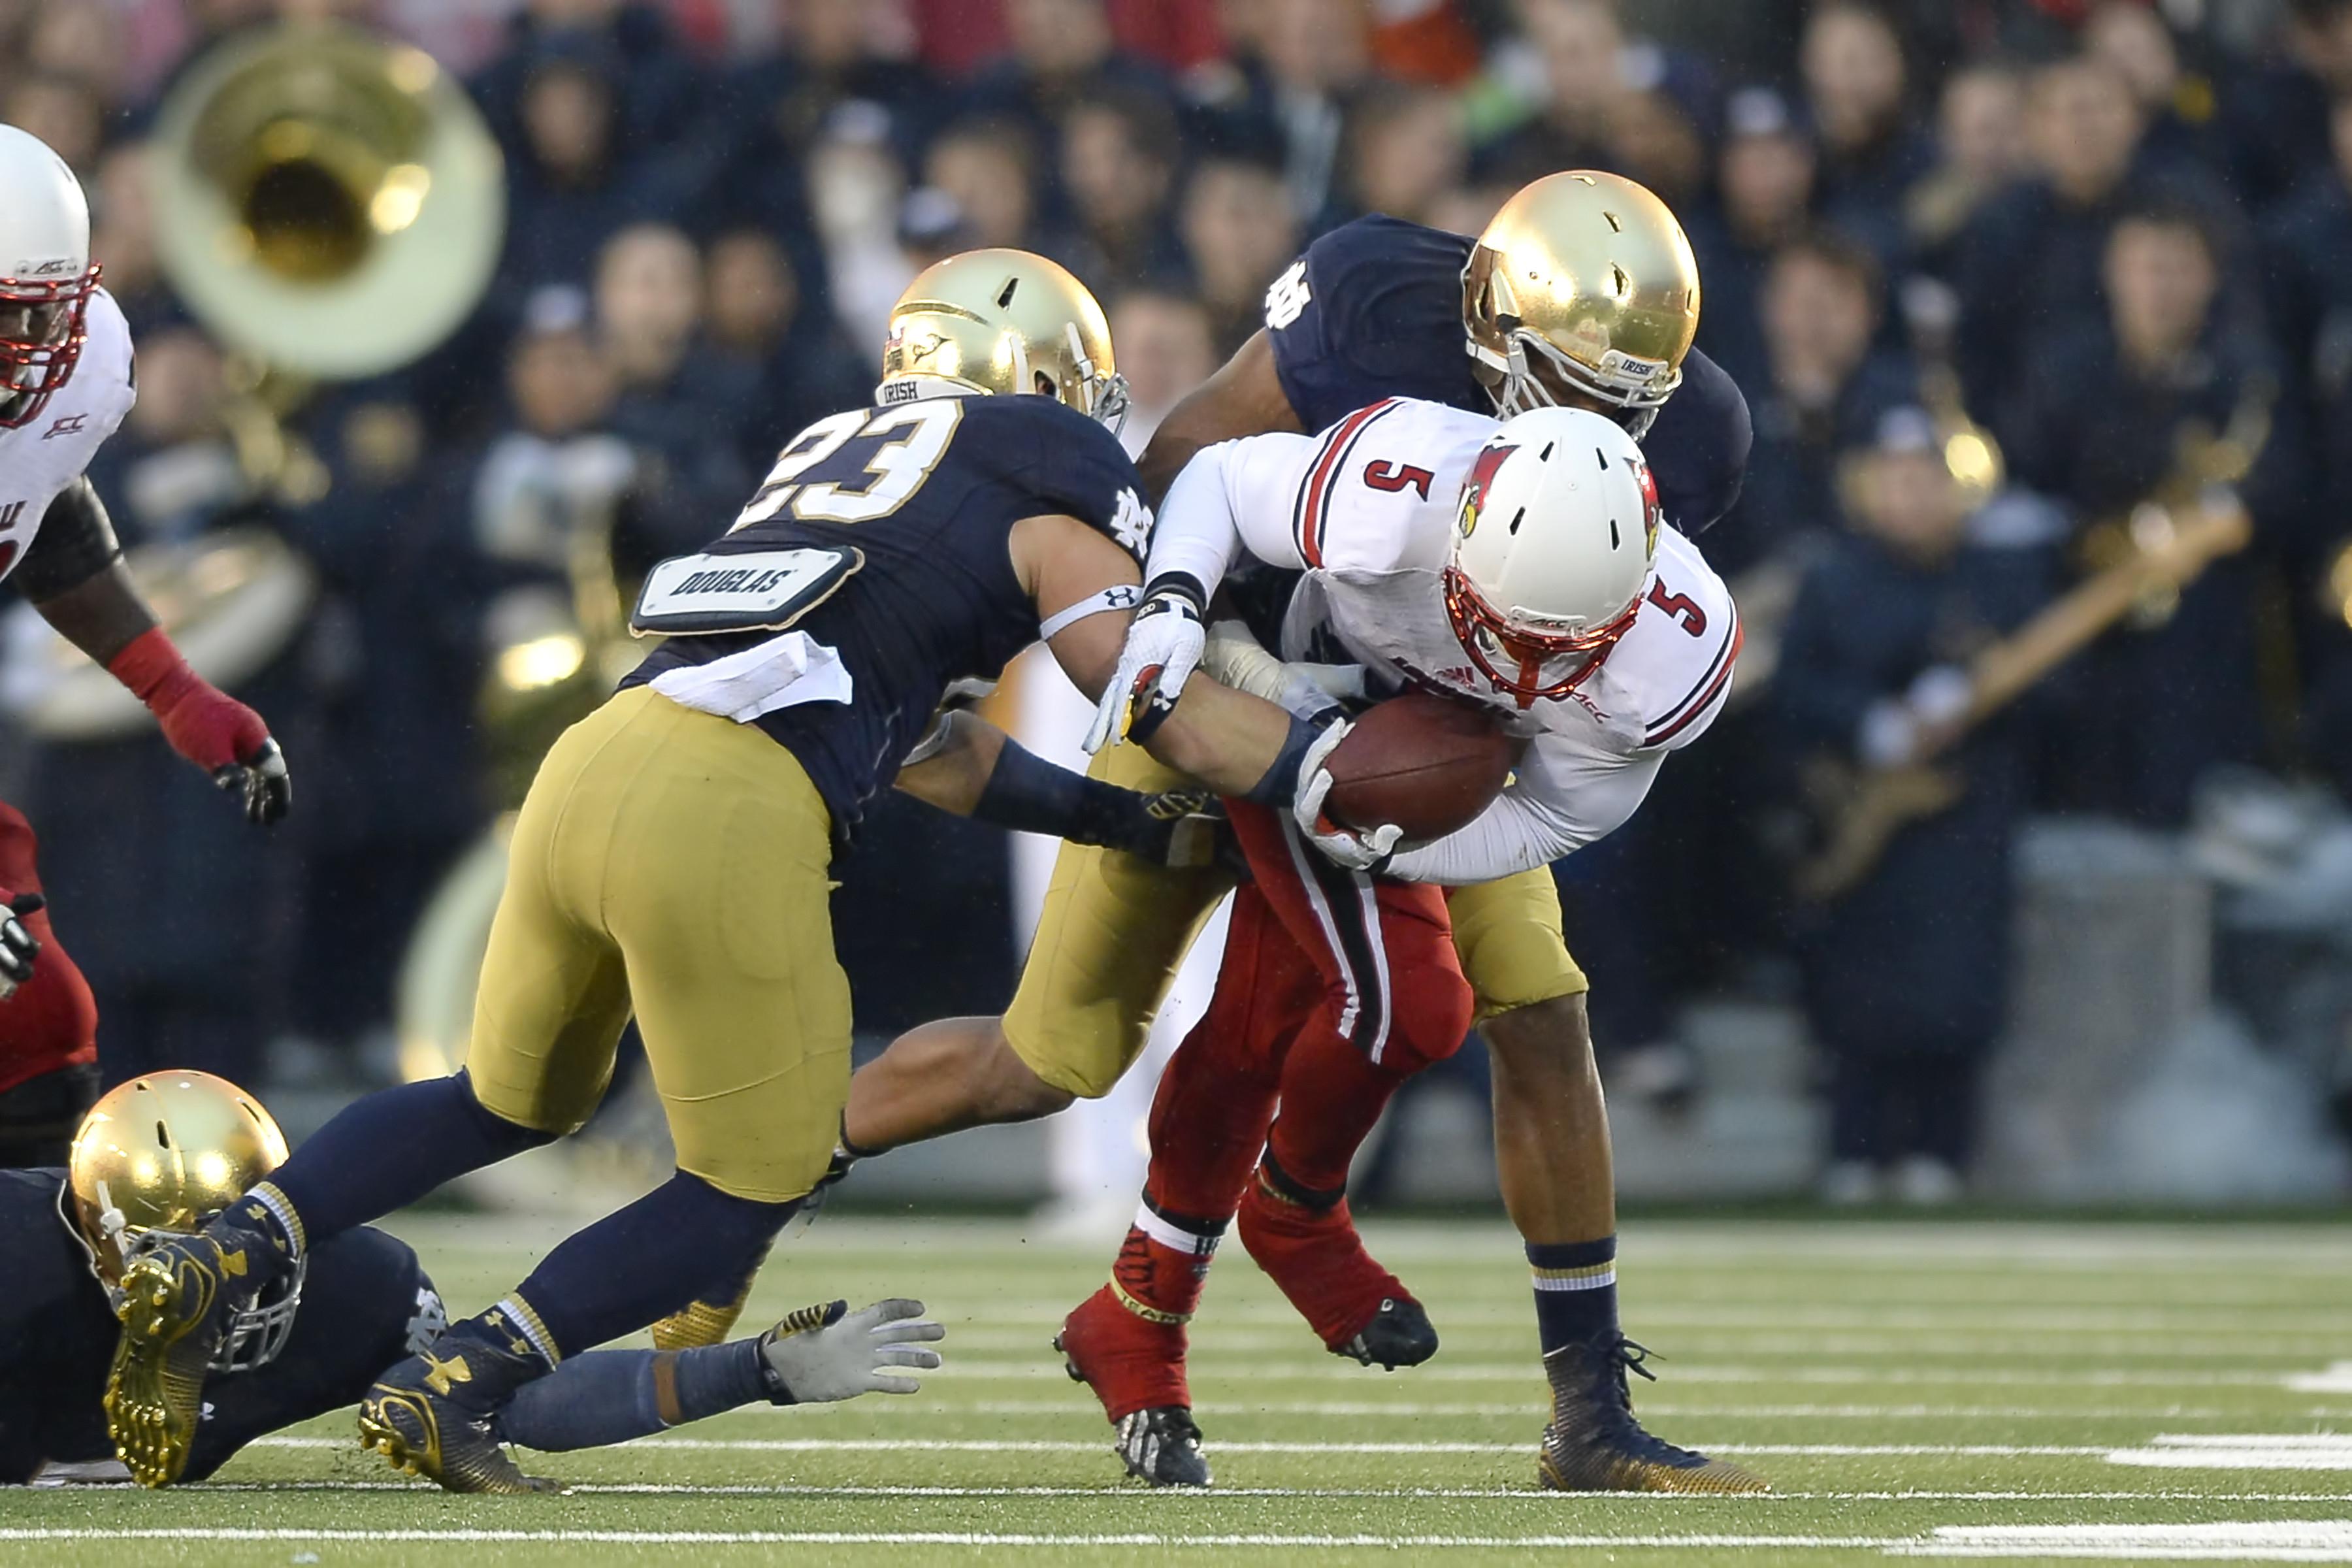 NCAA FOOTBALL: NOV 22 Louisville at Notre Dame